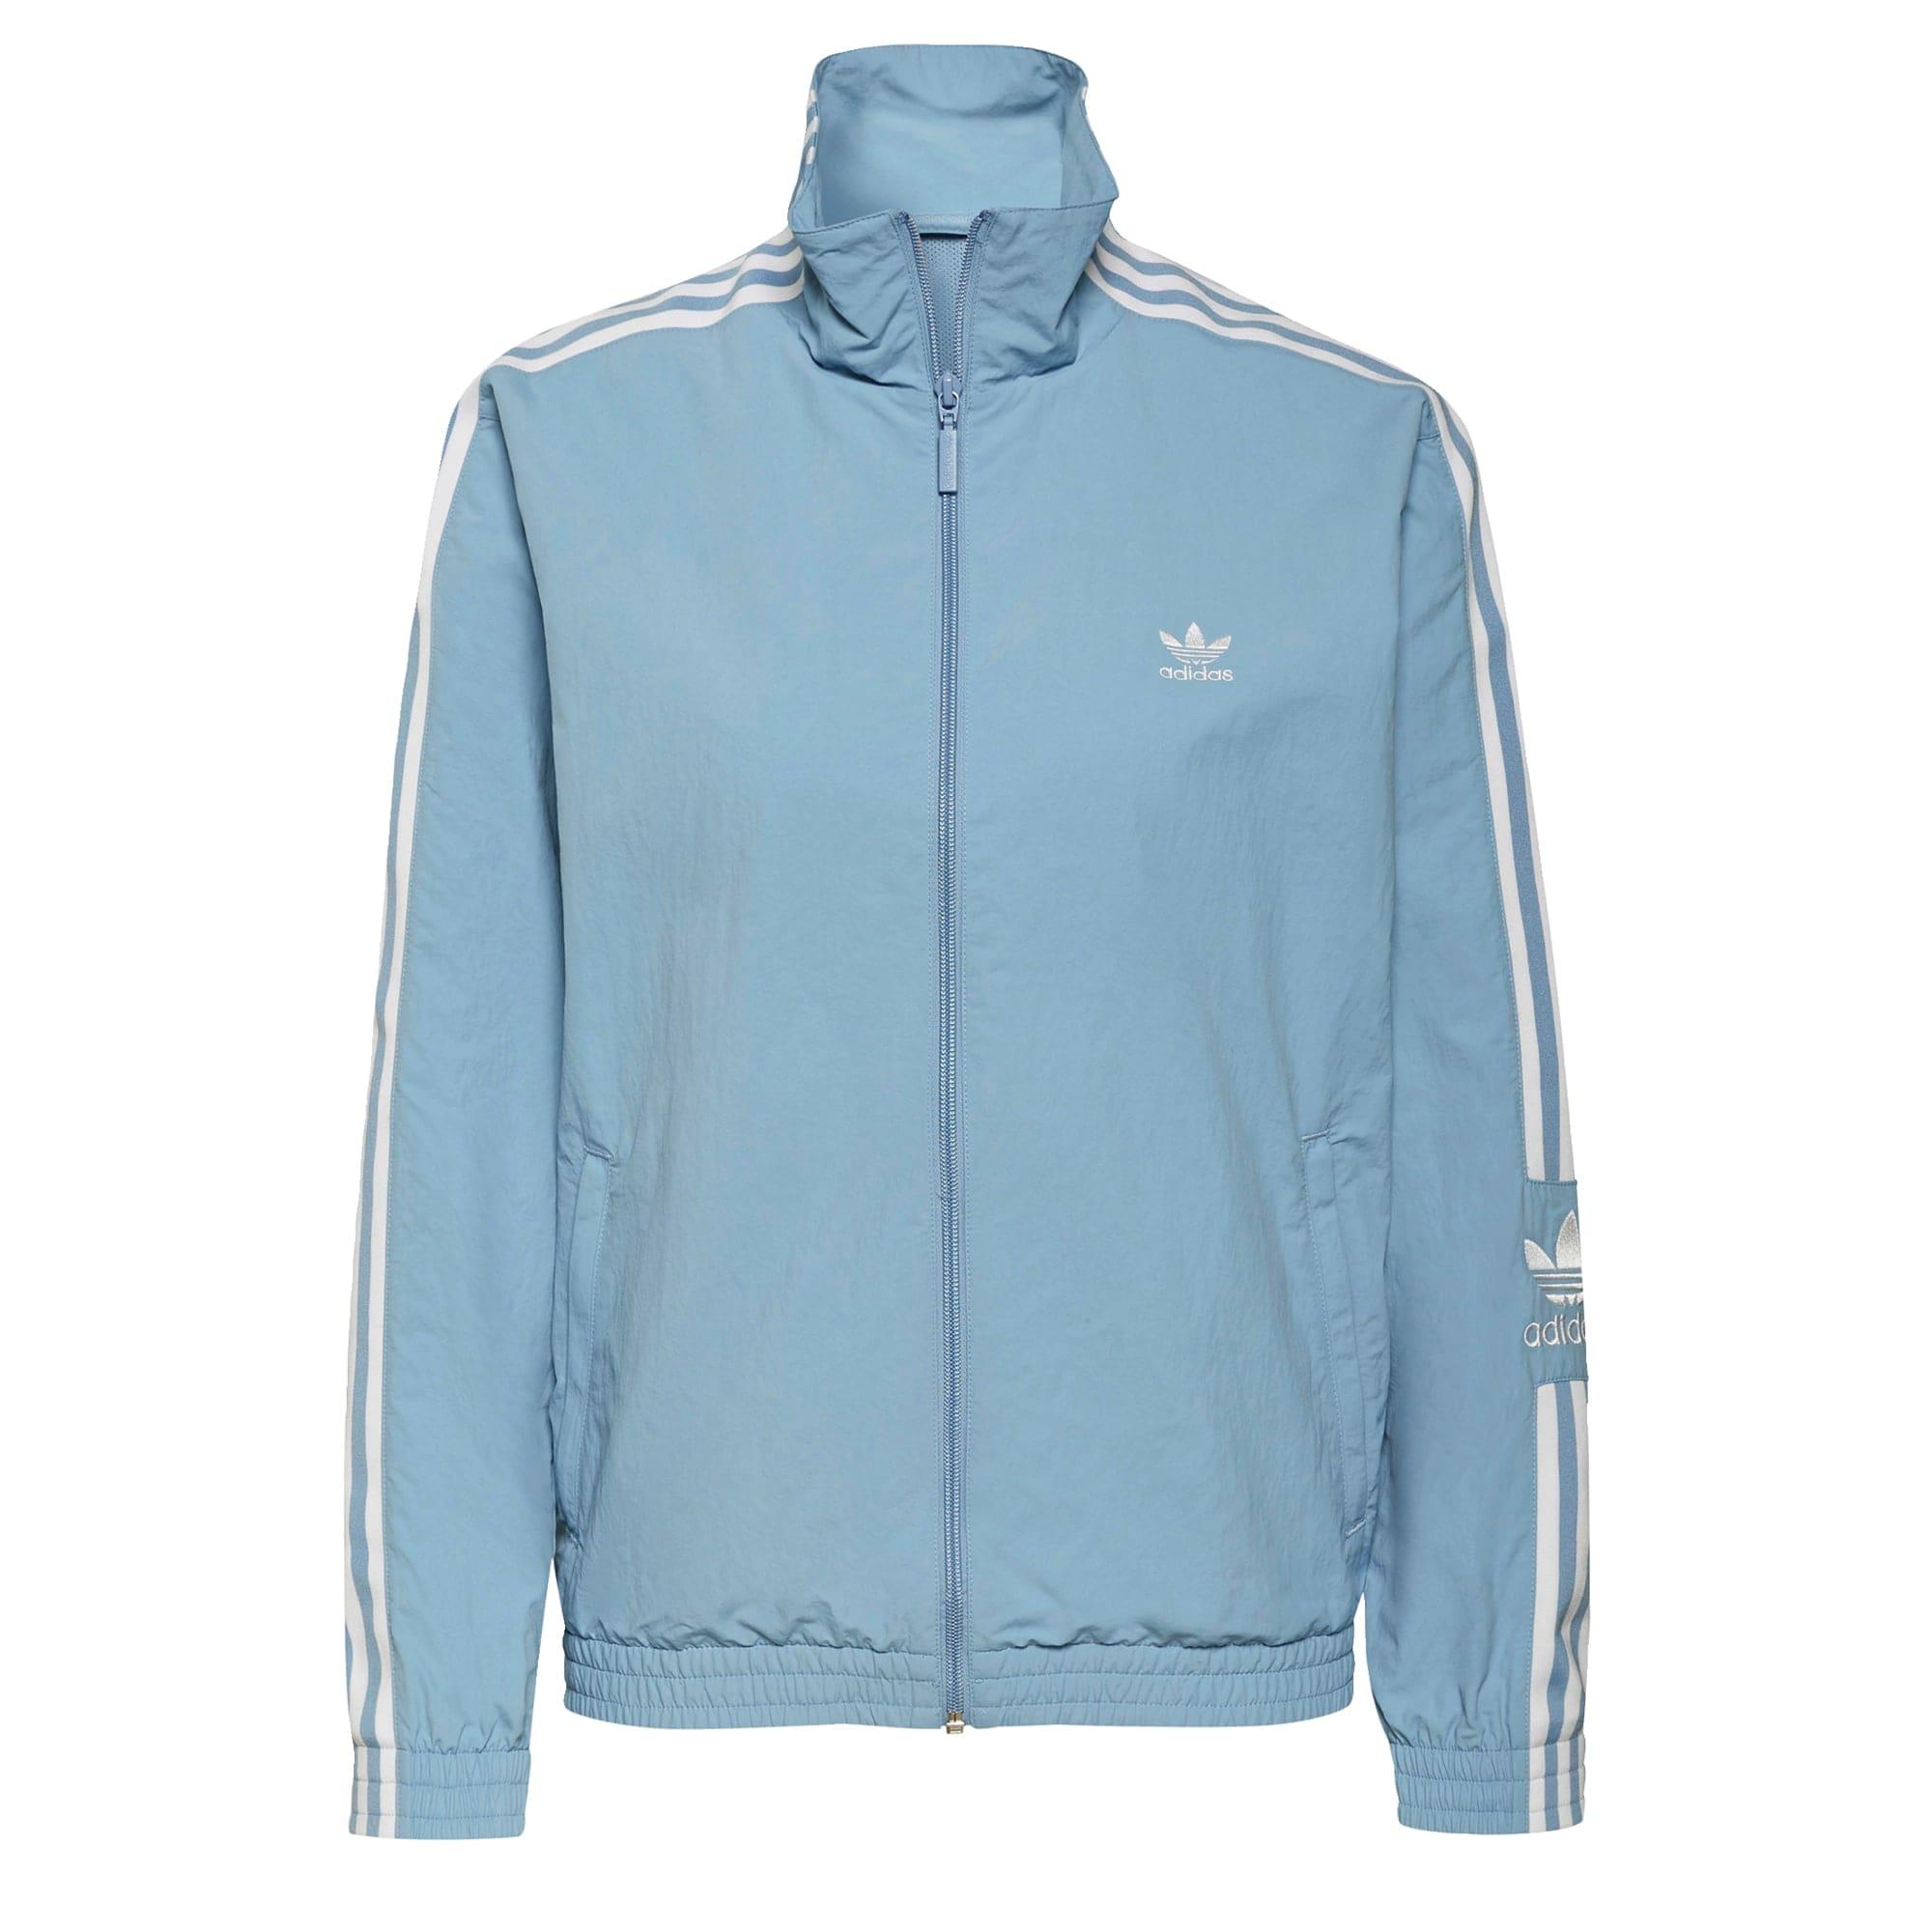 ADIDAS ORIGINALS Demisezoninė striukė mėlyna dūmų spalva / balta